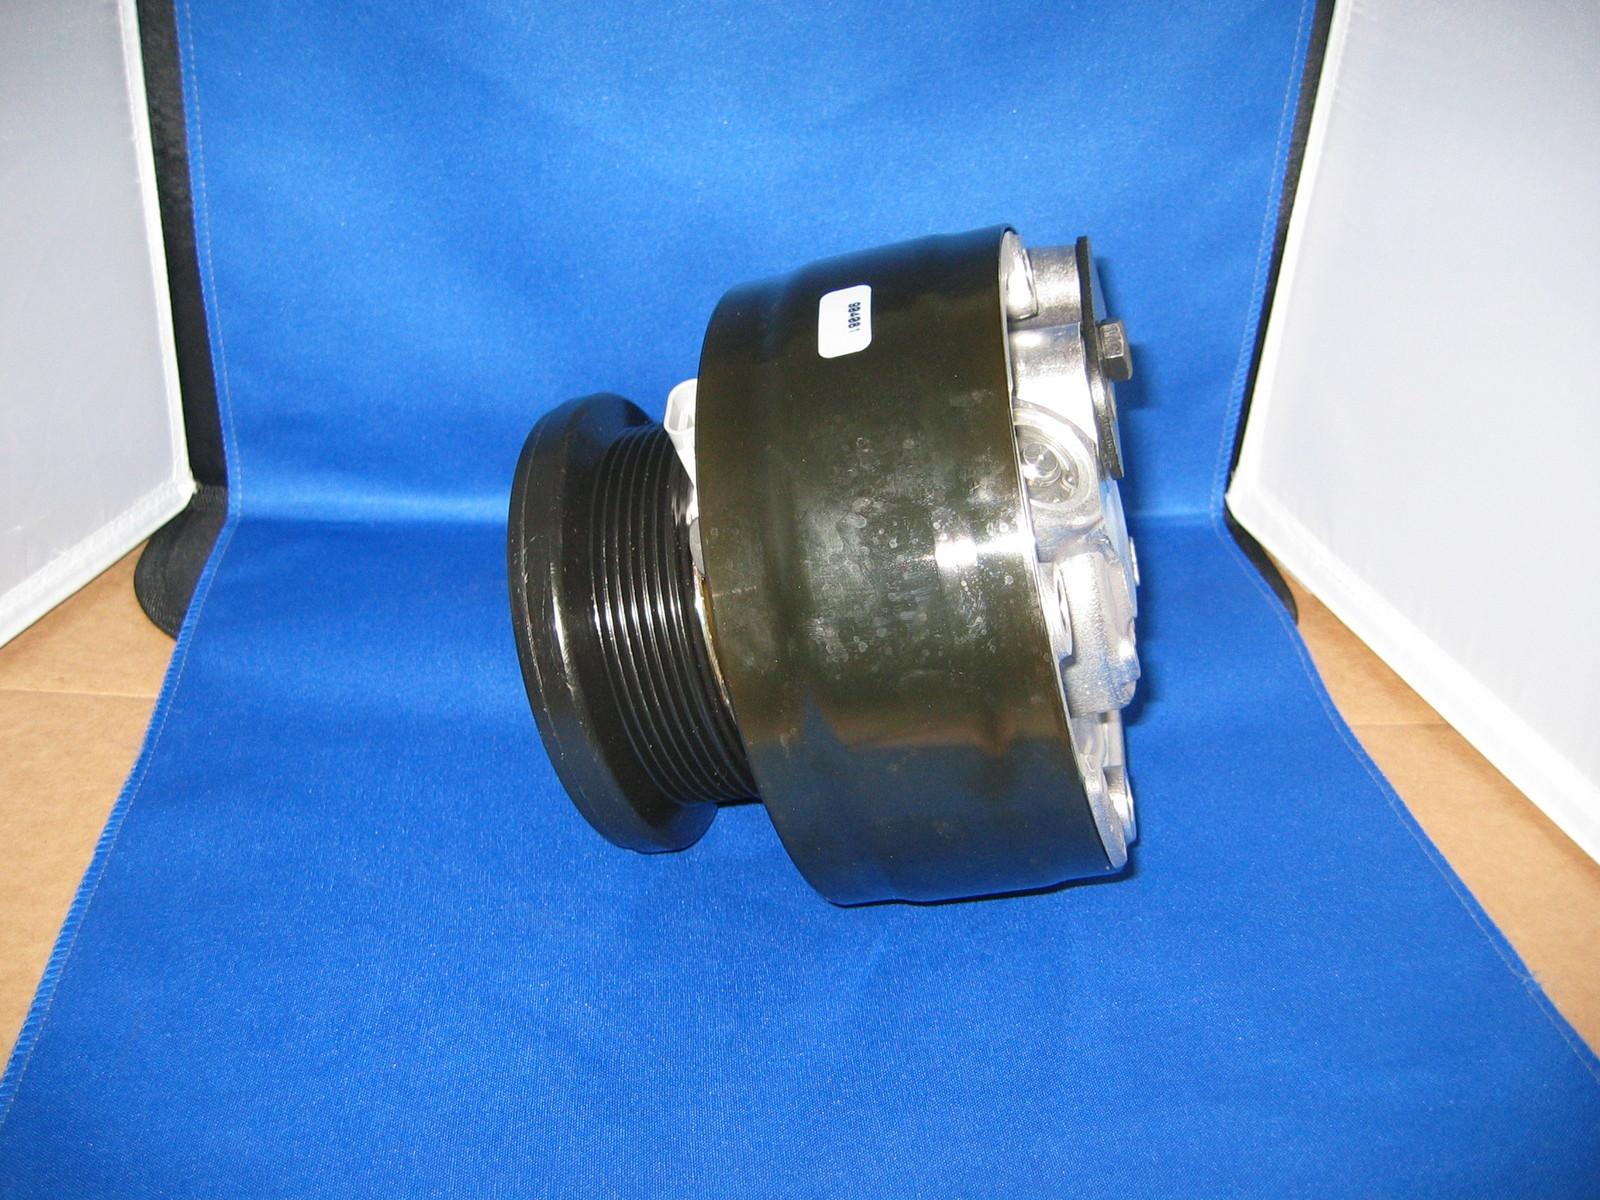 80-84 Chevy C10 Silverado Pickup AC Air Conditioning Compressor Repair Part